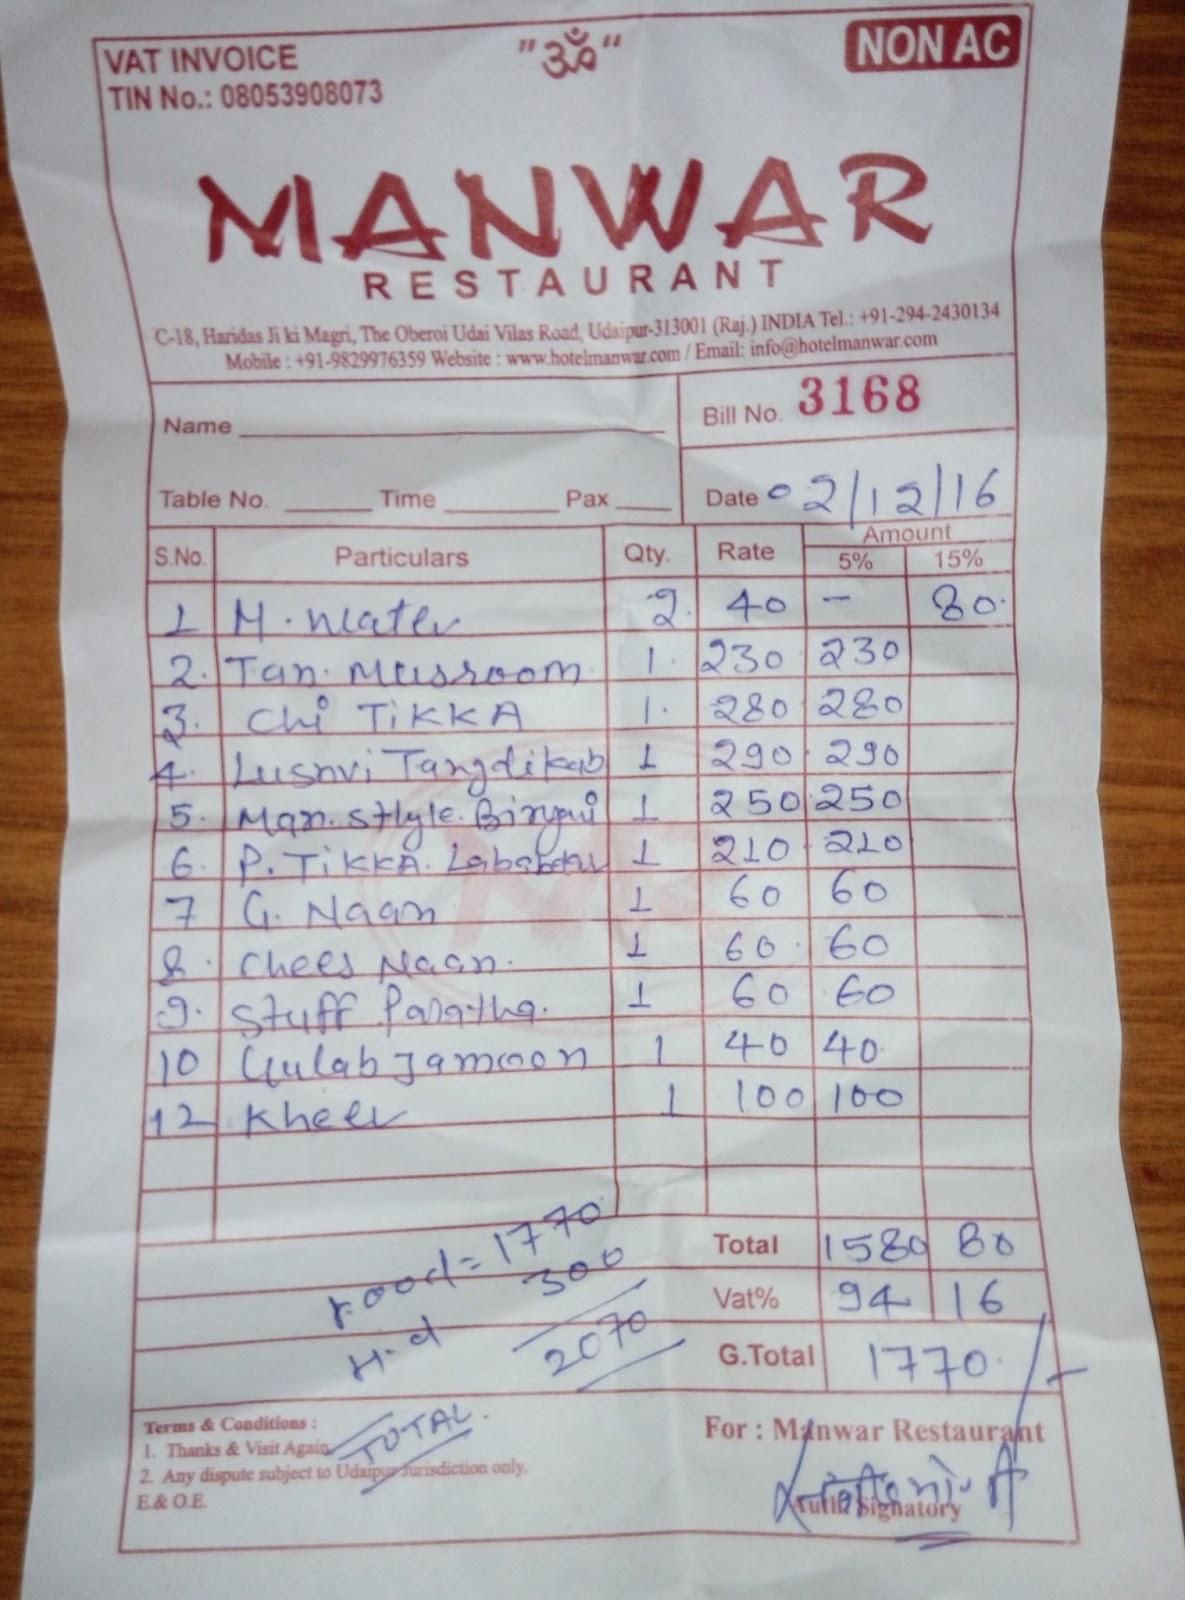 PROMO] Hotel Manwar C 18 Haridas Cheap Hotels Udaipur India